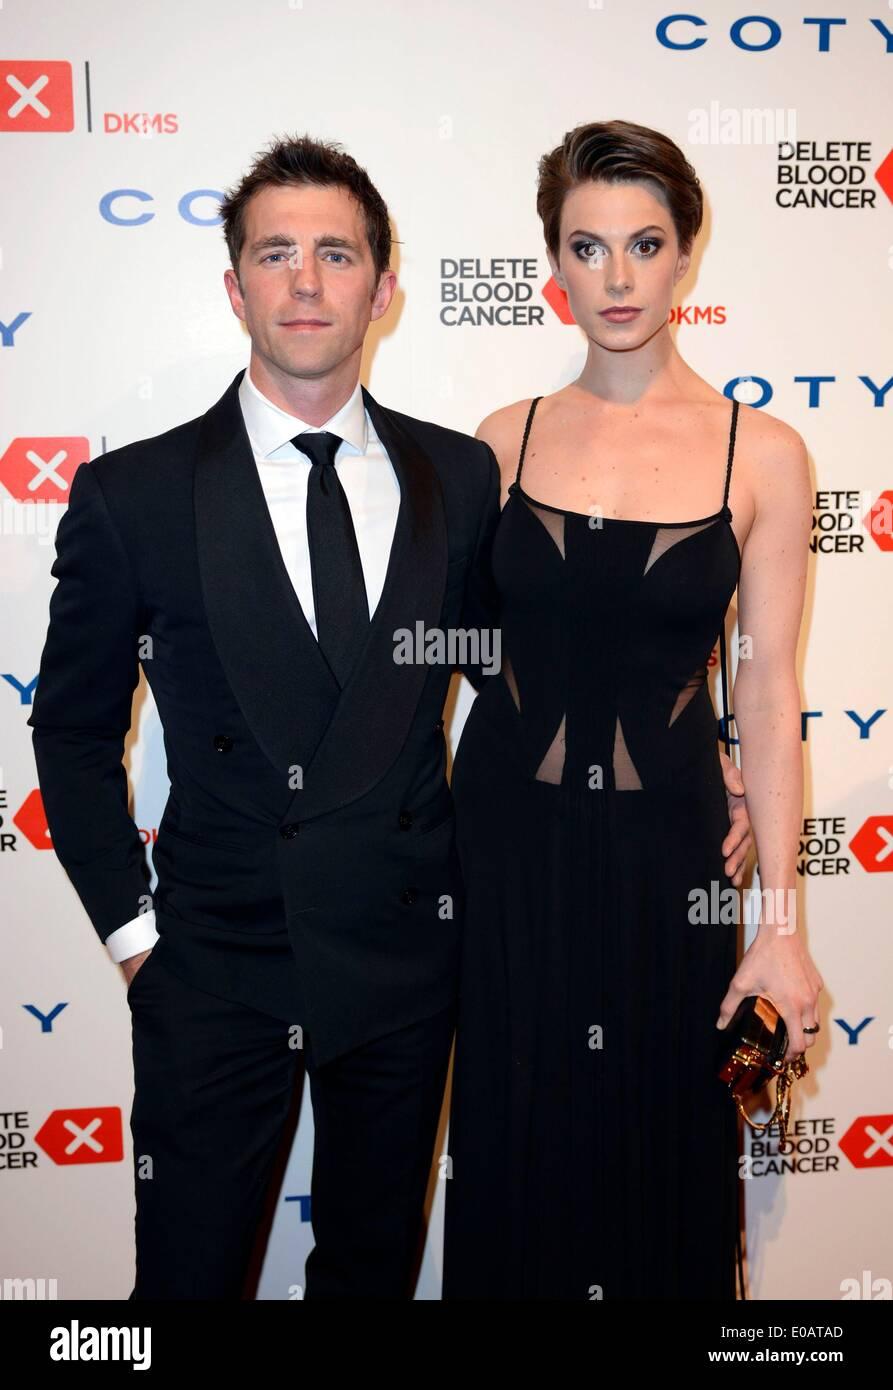 Elizabeth Banks,Christian Bale (born 1974) XXX video Charlotte Cornwell (born 1949),Aimee Kelly